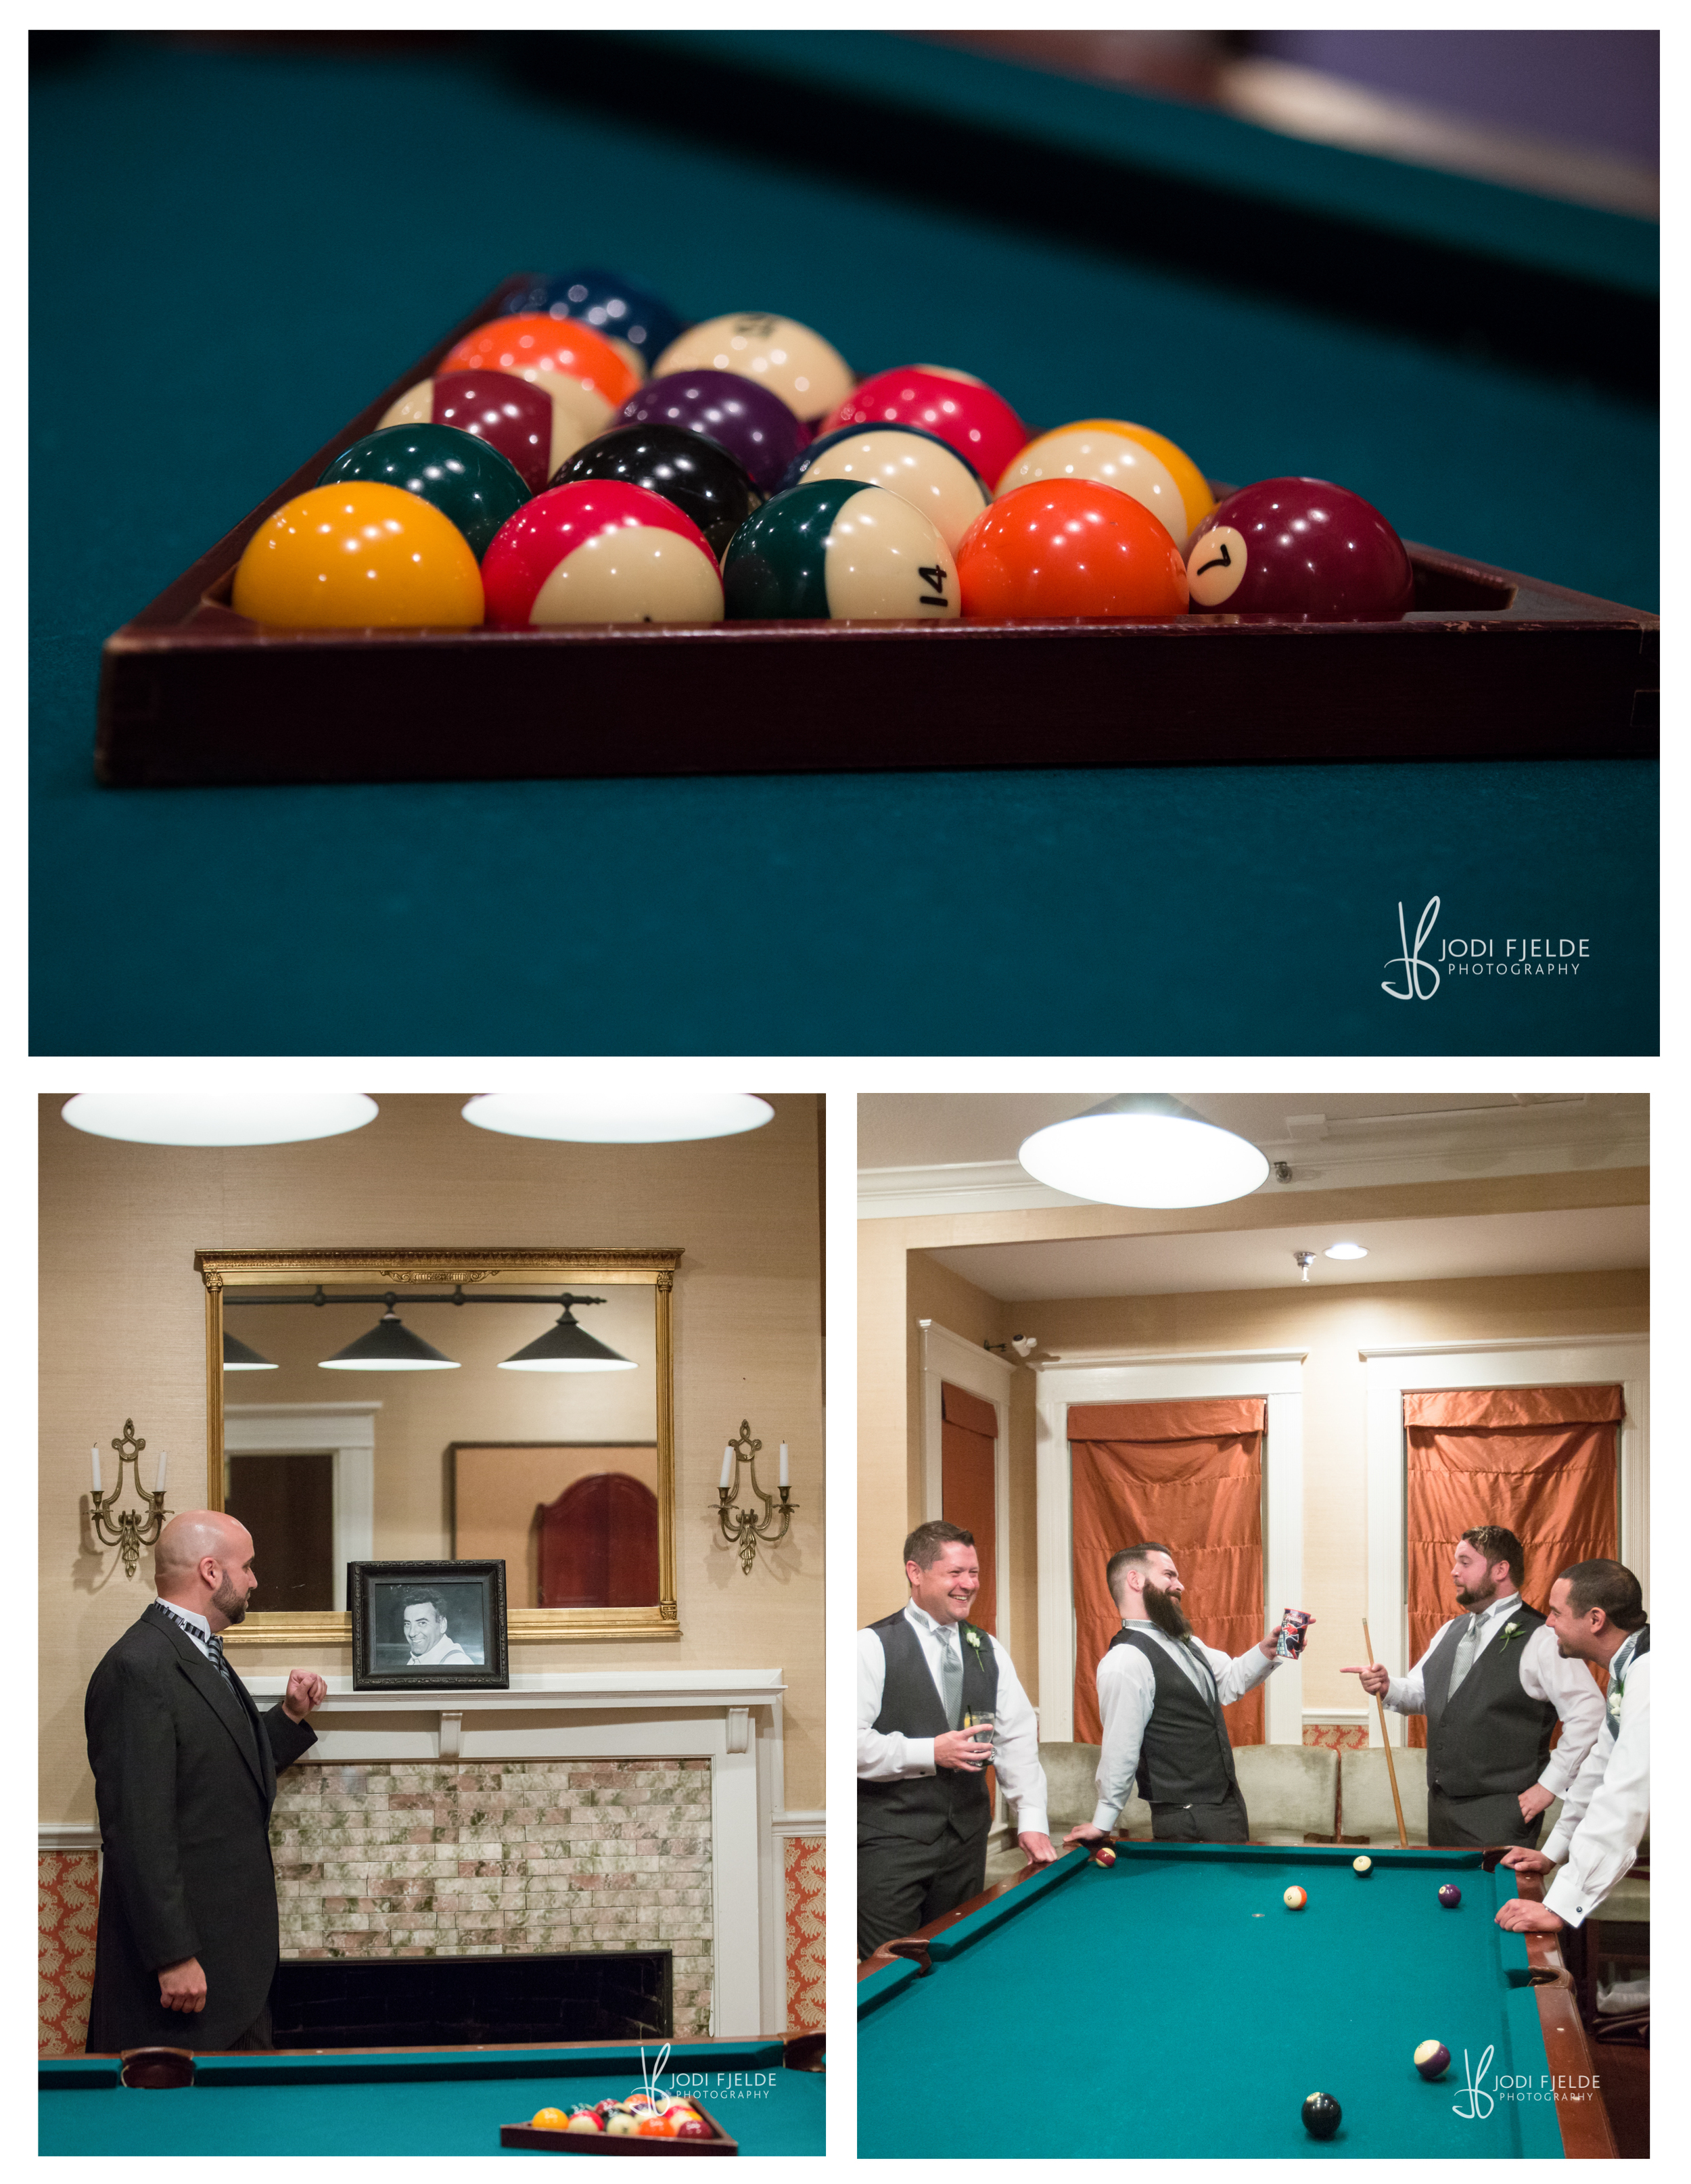 Highland_Manor_Apopka_Florida_wedding_Jackie_&_Tim_photography_jodi_Fjelde_photography-7.jpg